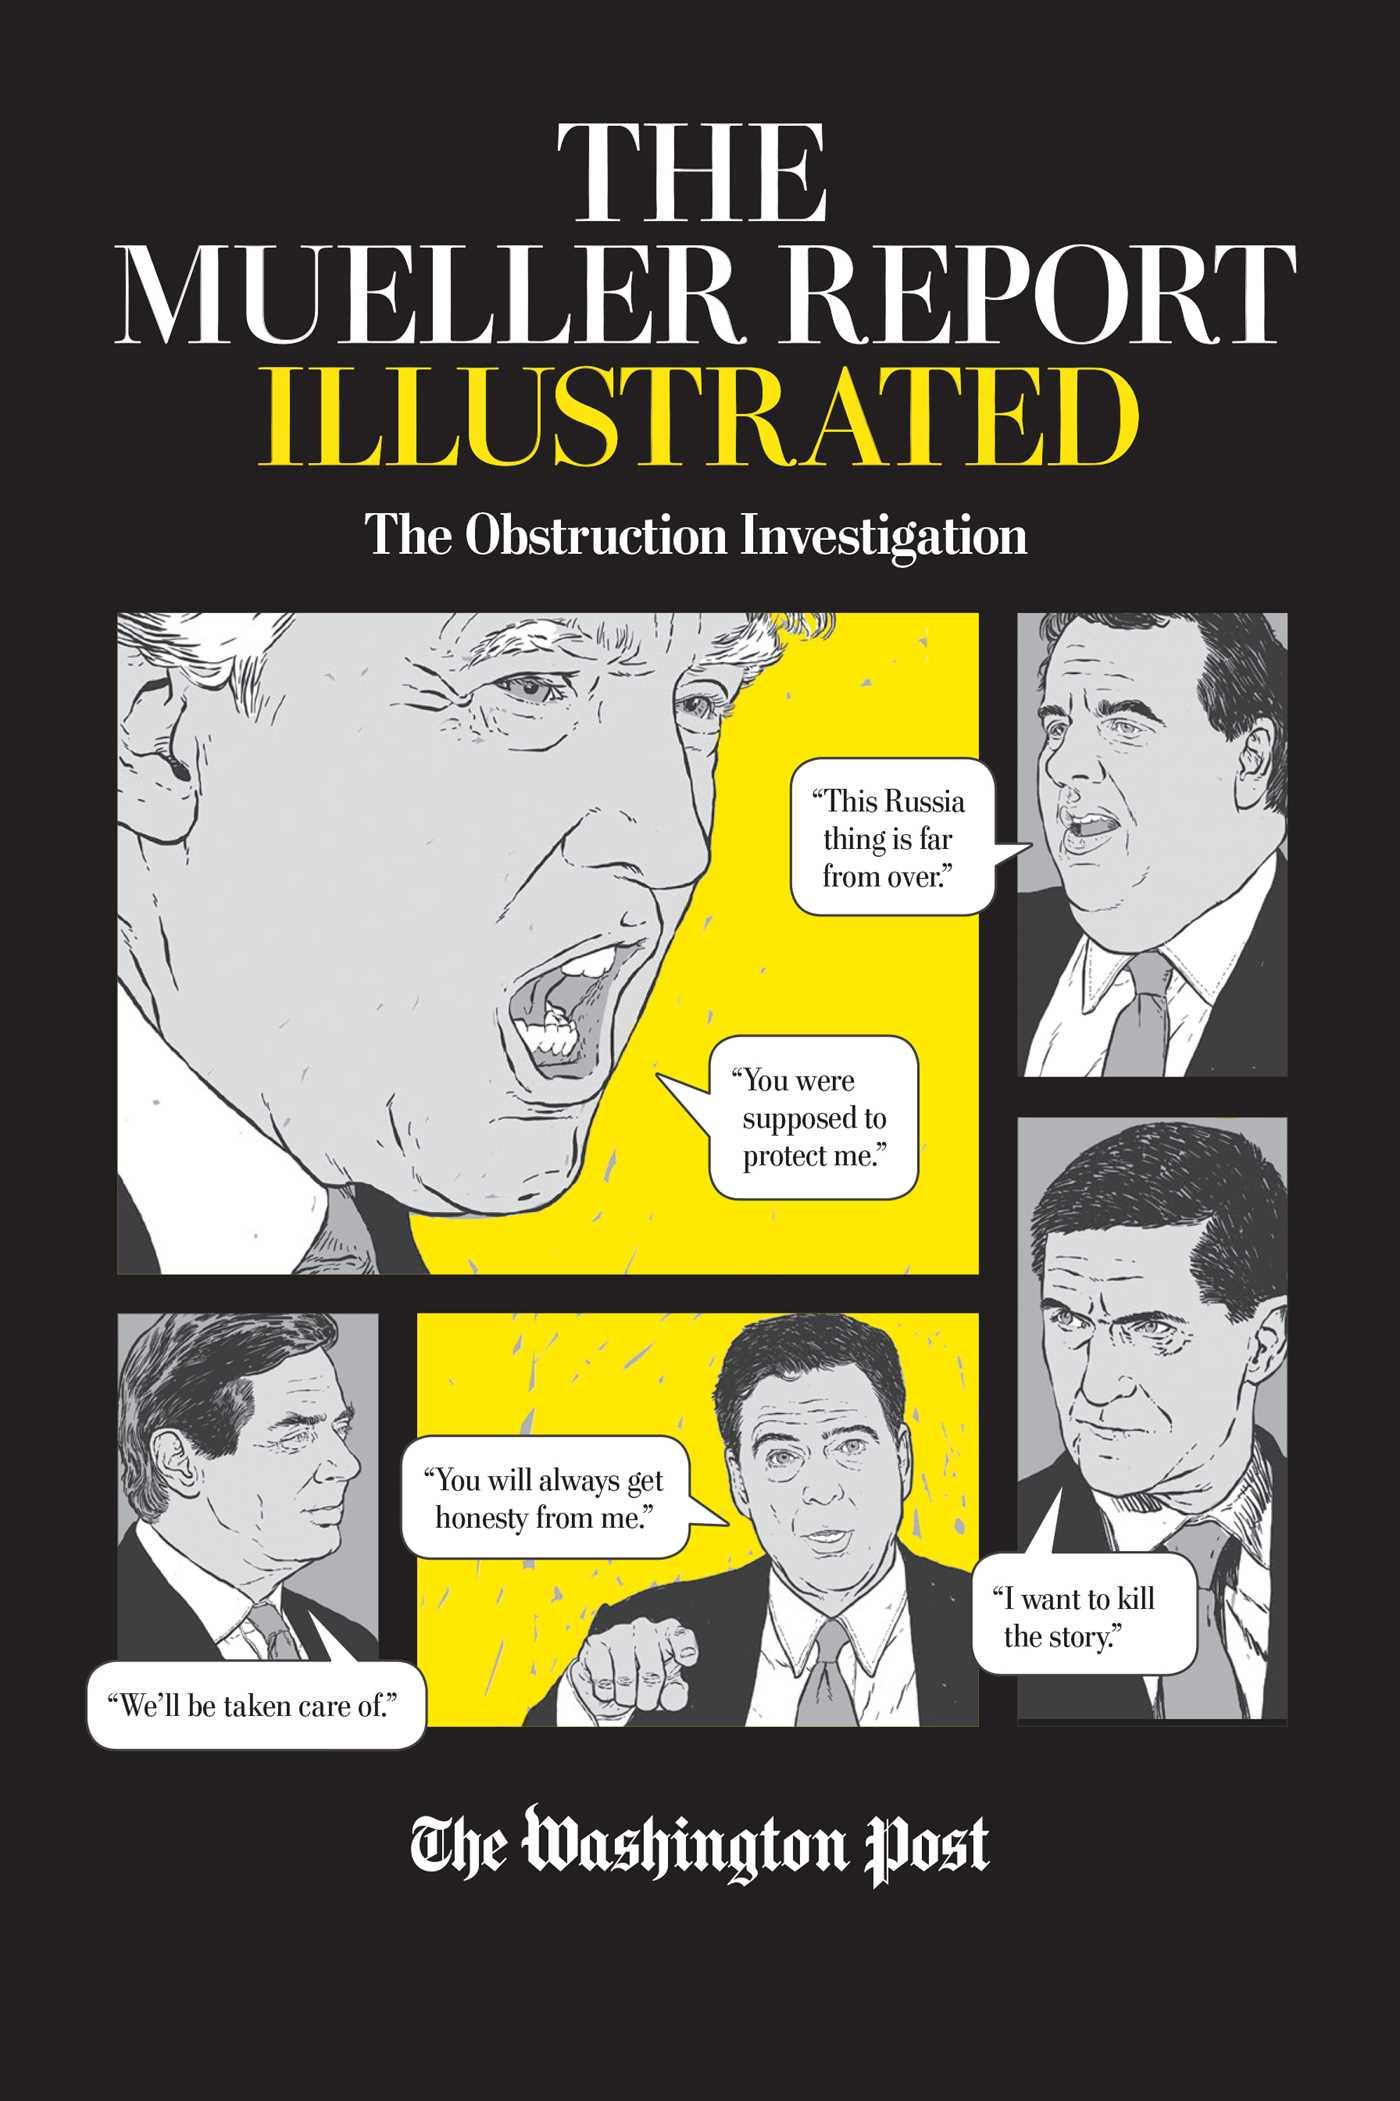 The Washington Post - Jan